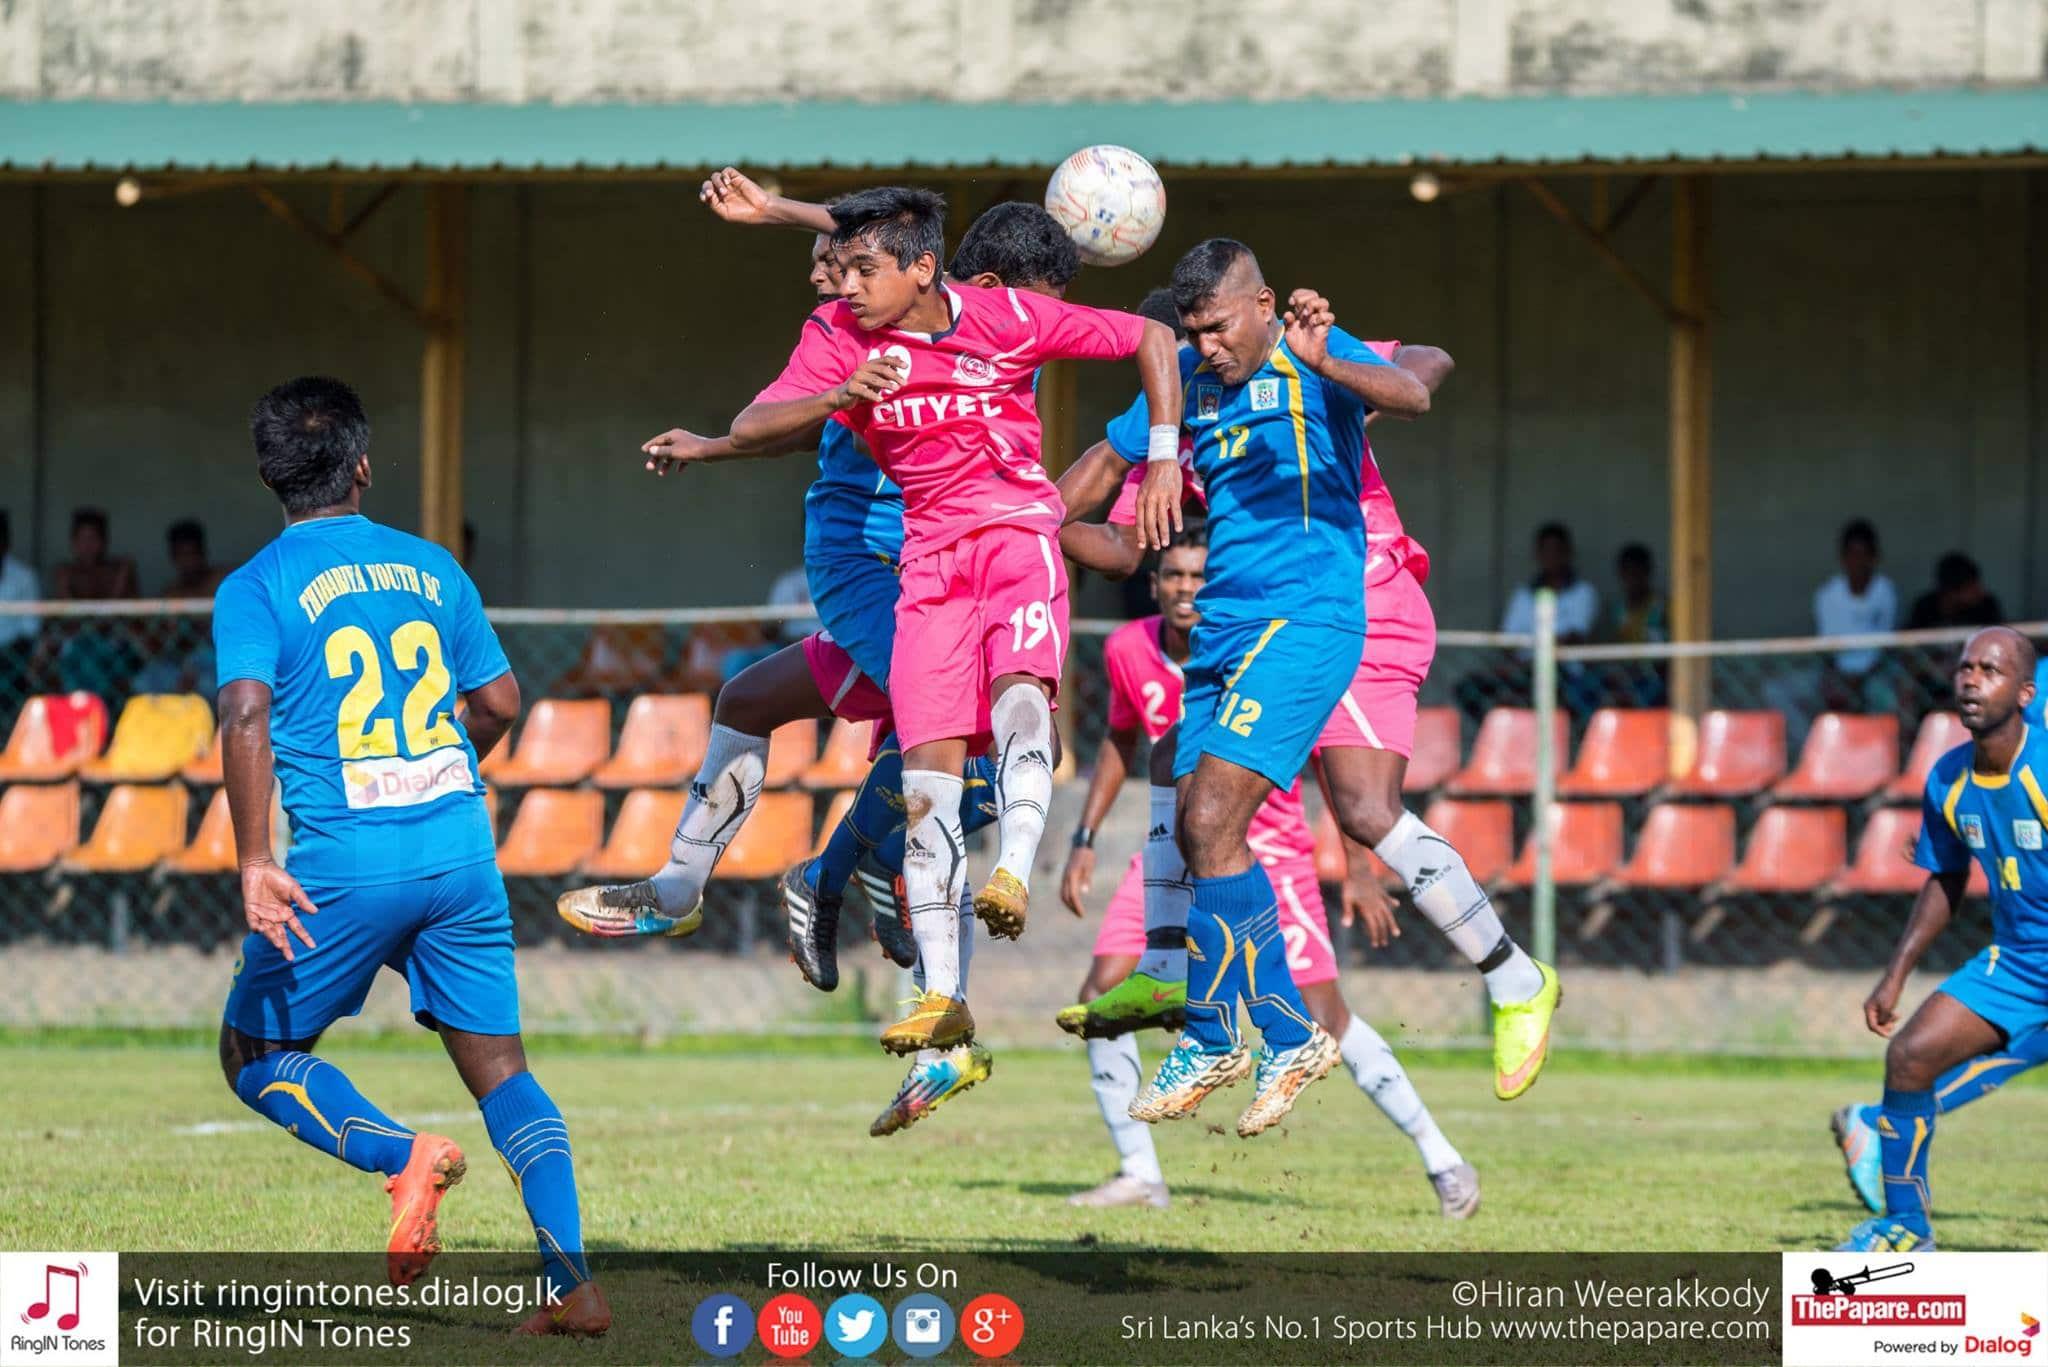 Java Lane SC v Thihariya Youth - FA Cup 2016